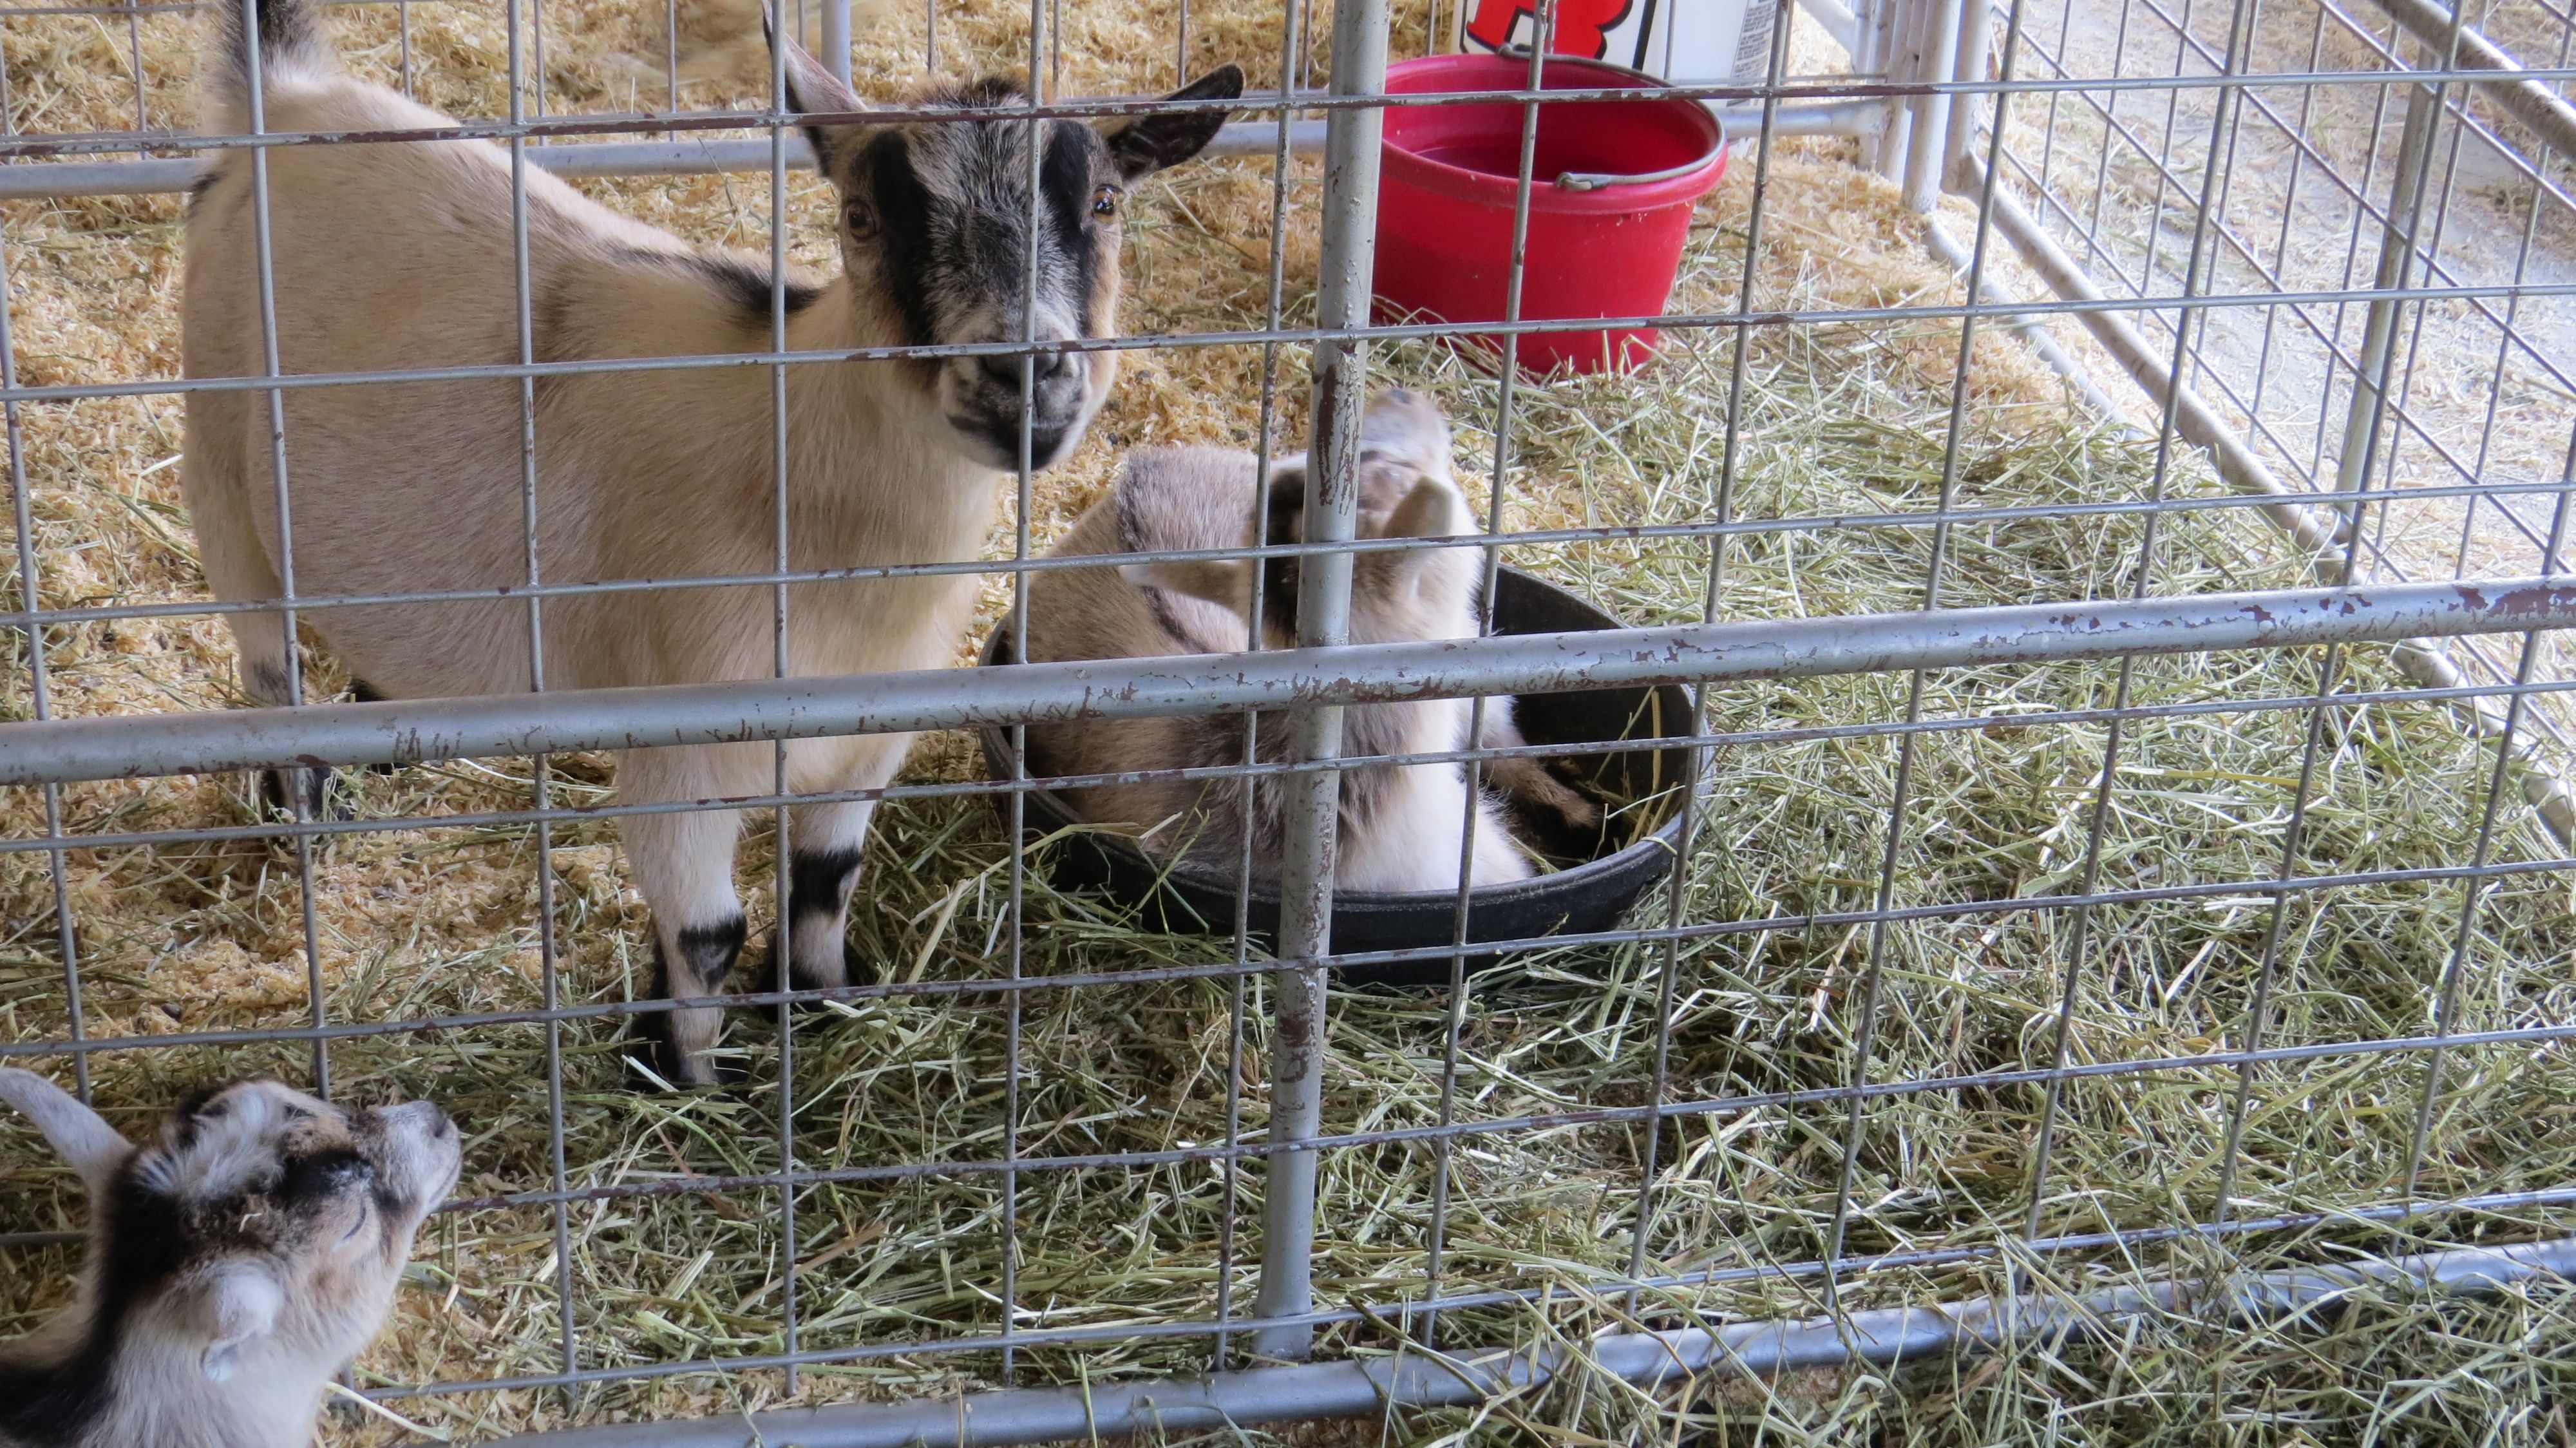 goats 4H Fair Rural landscape, Rural, Animals